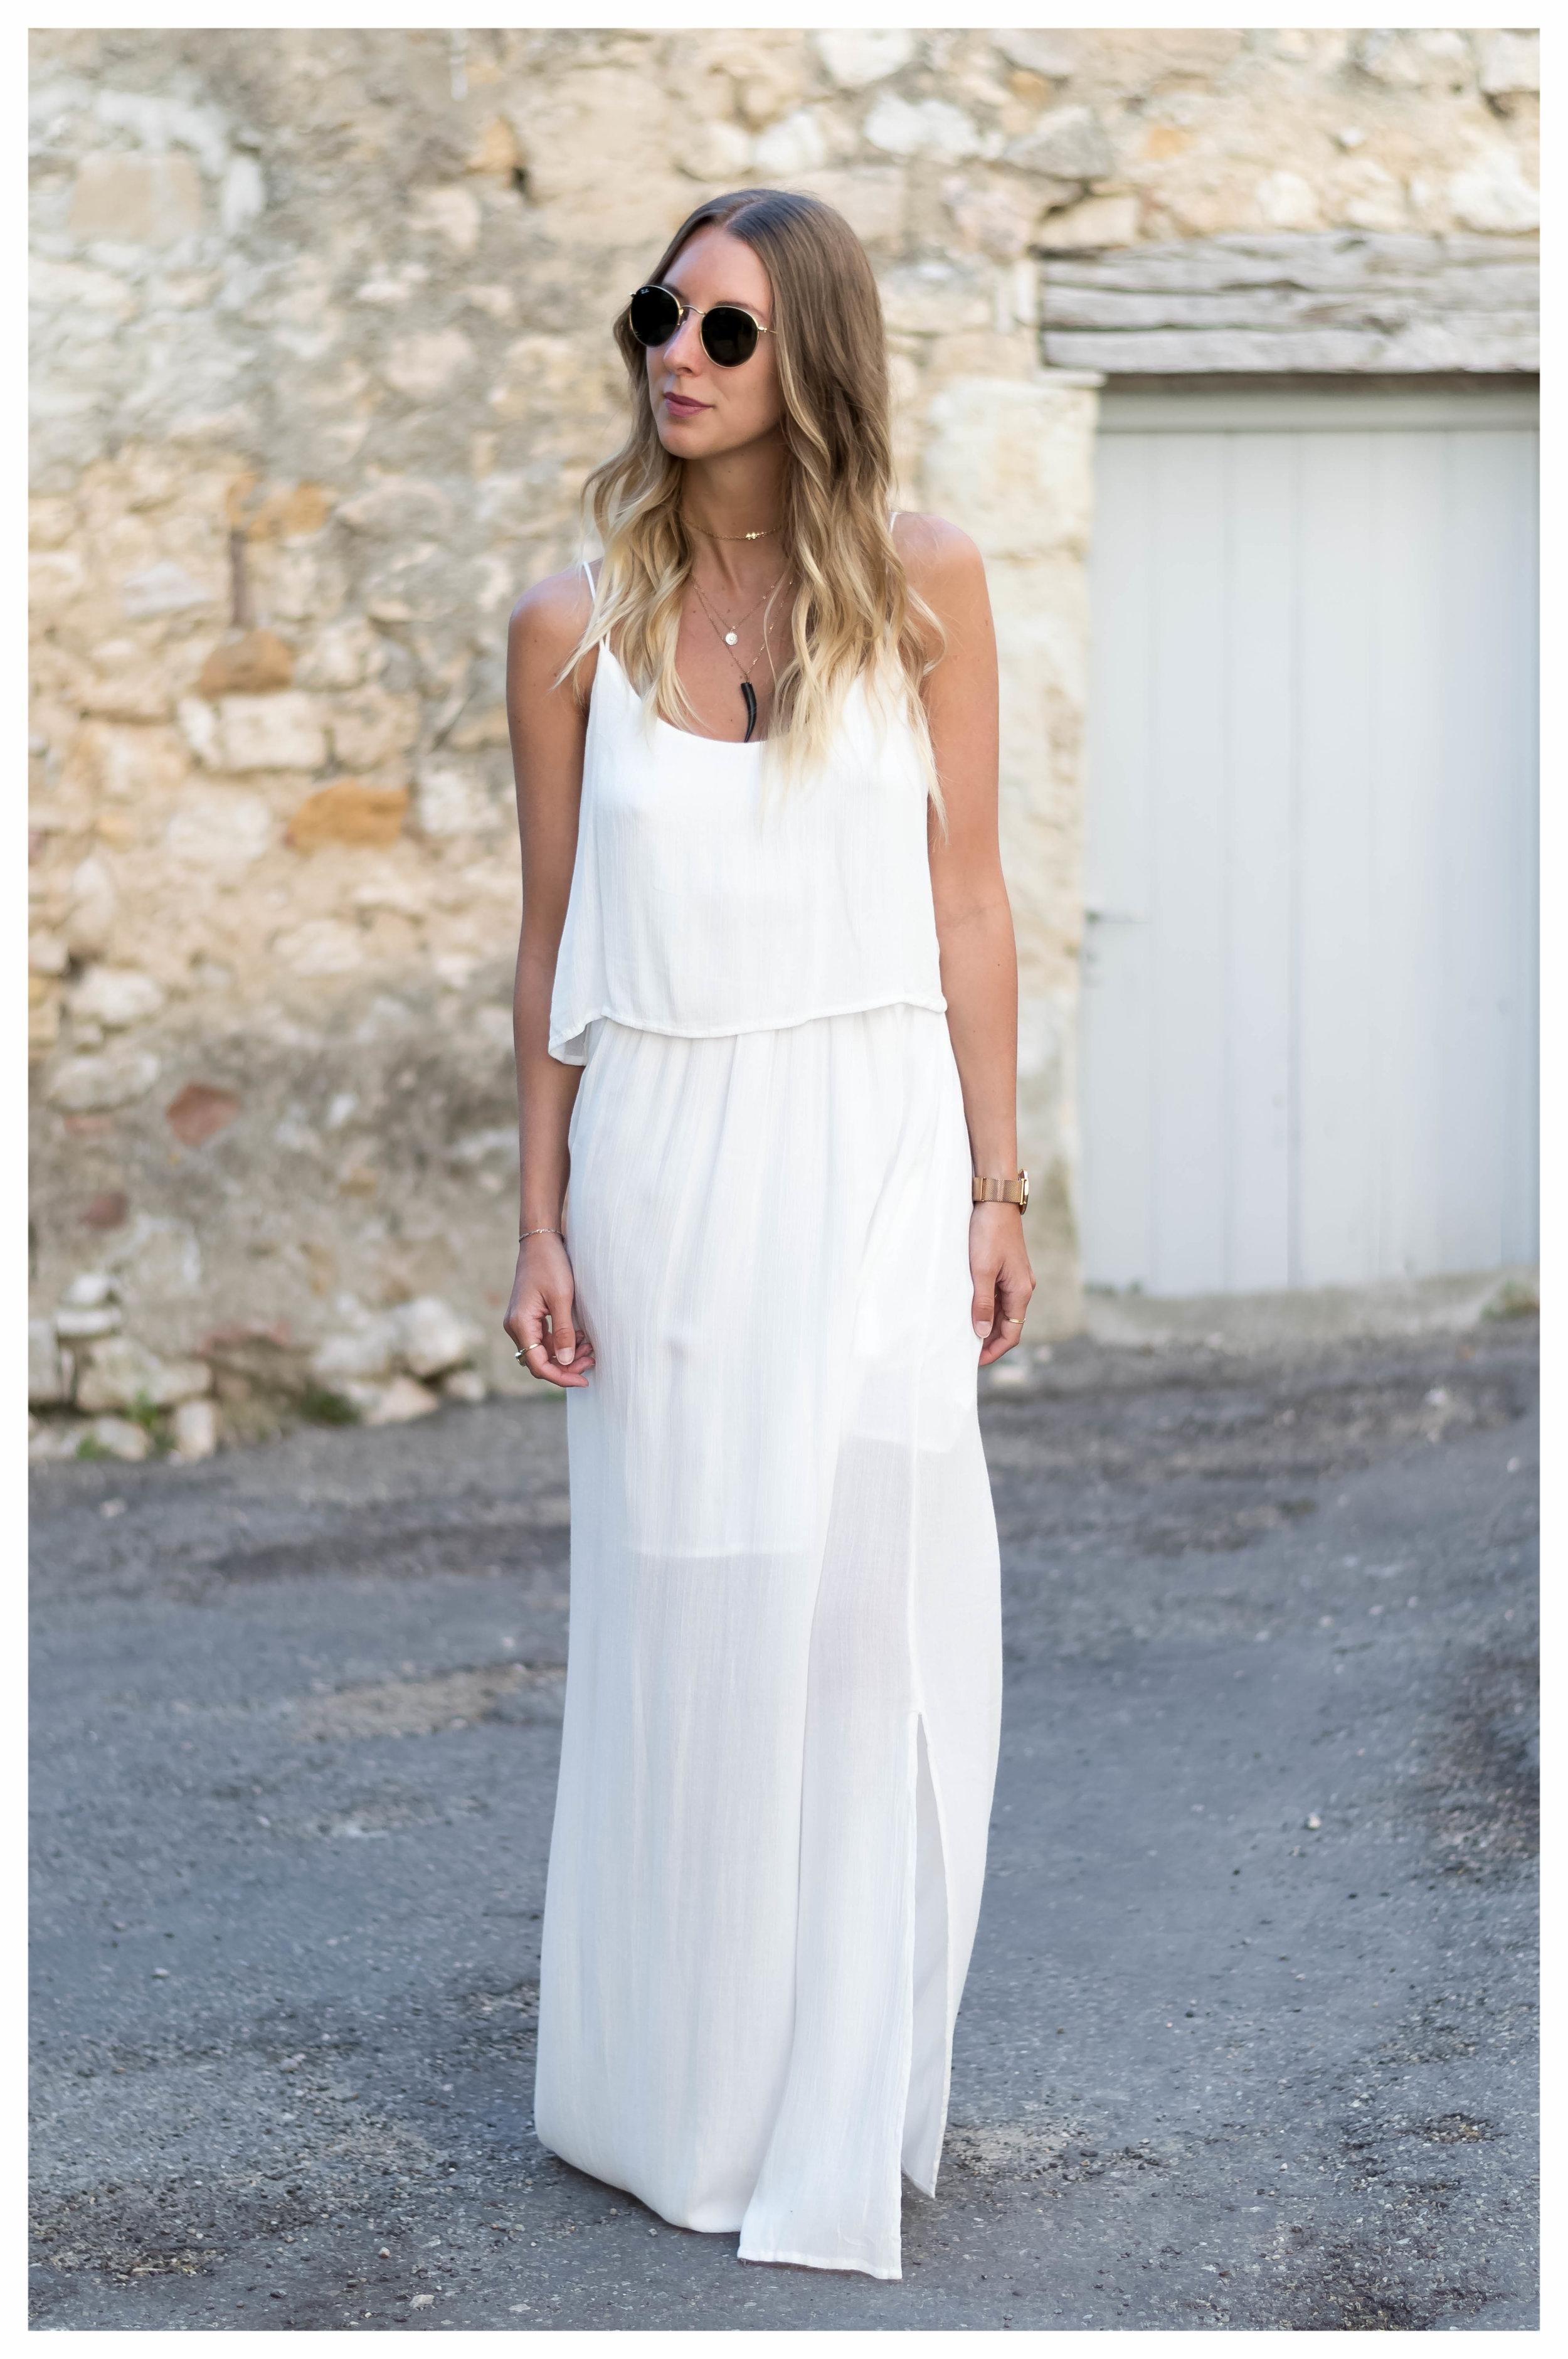 White Dress - OSIARAH.COM (6 sur 16).jpg